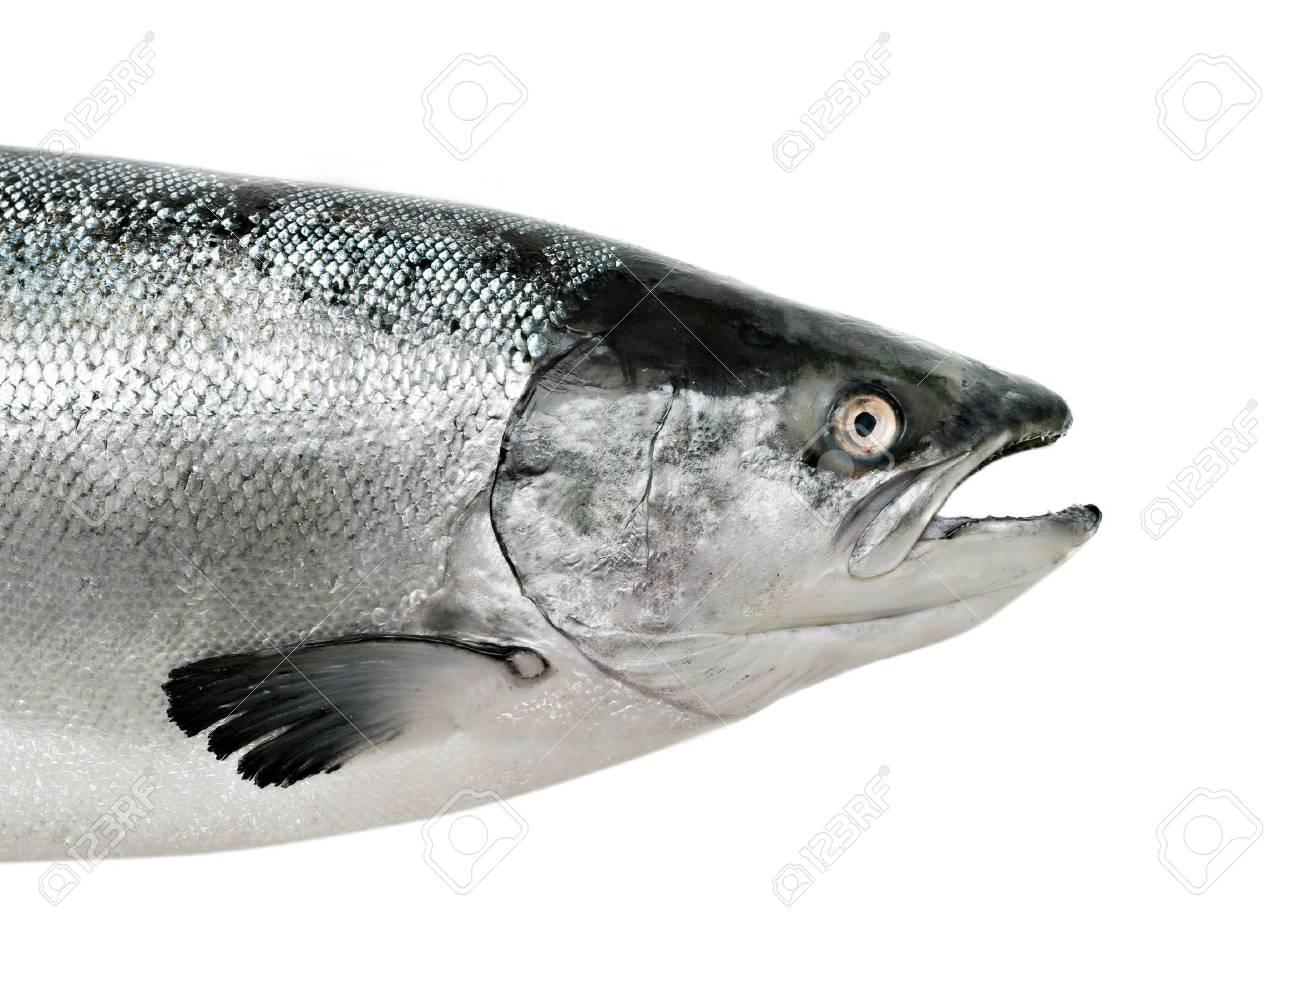 Salmon fish close up isolated on white Stock Photo - 6852587